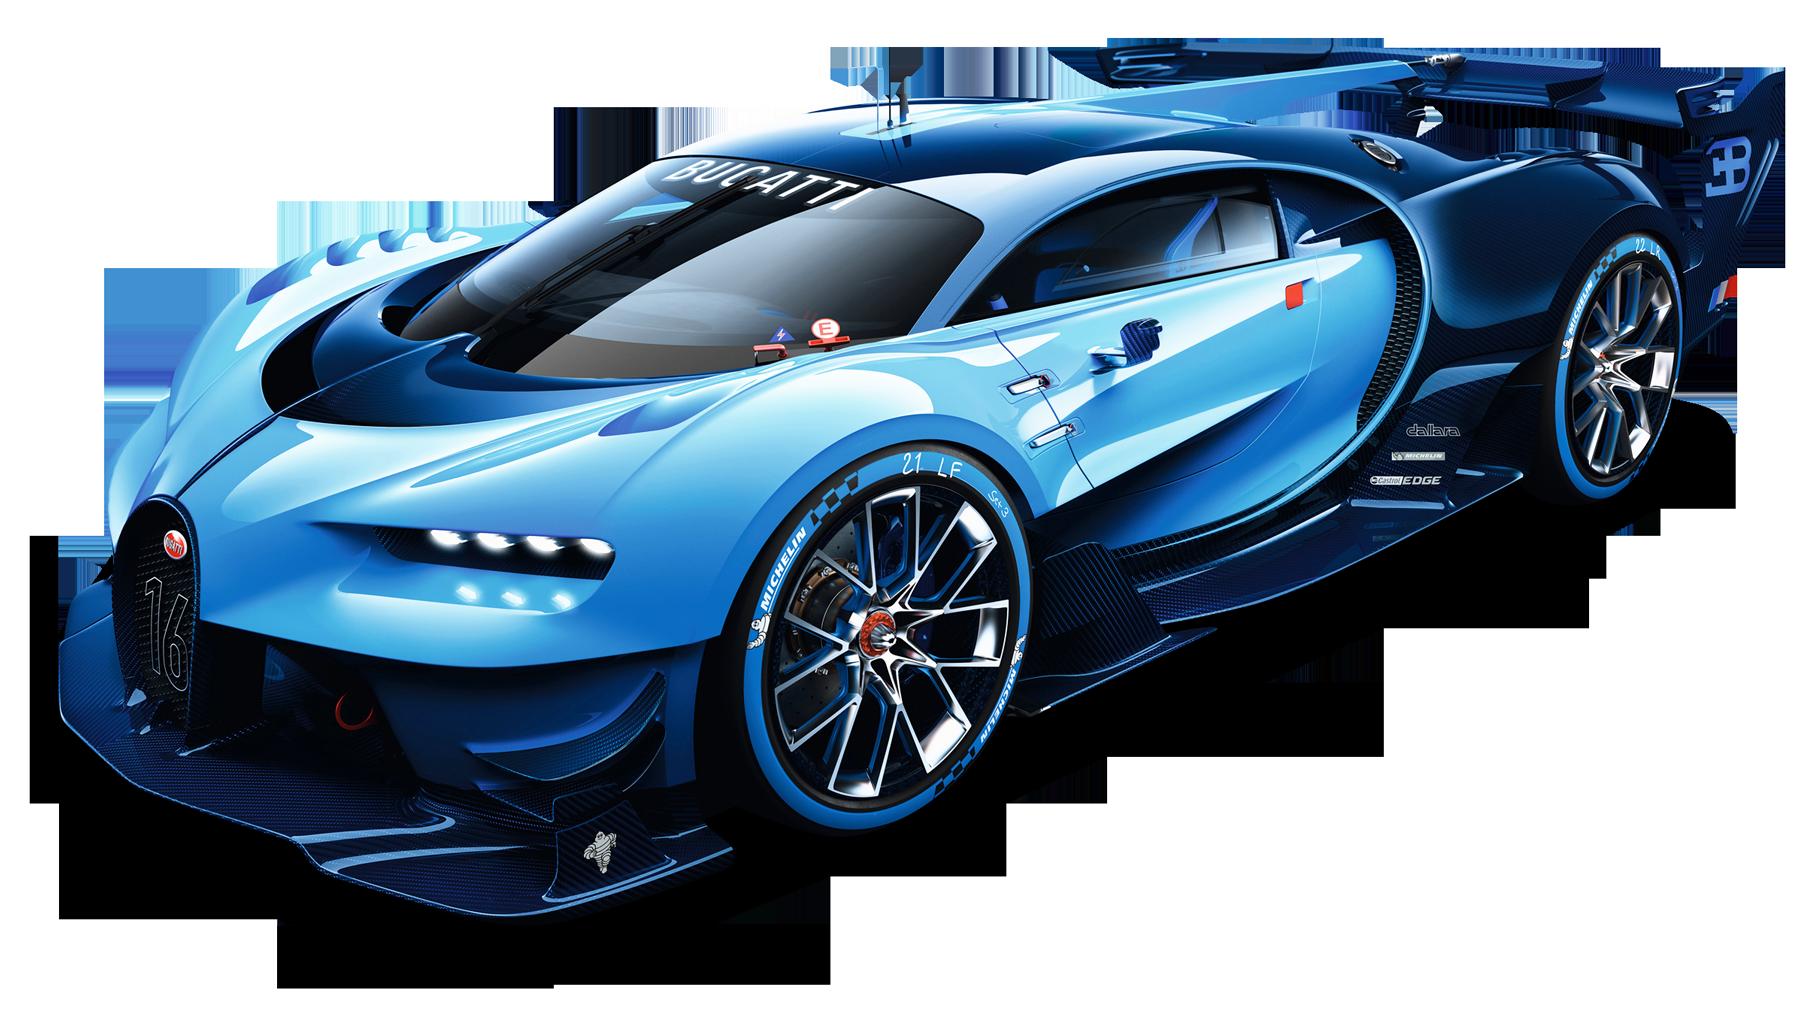 Bugatti Veyron Compact car Automotive design.